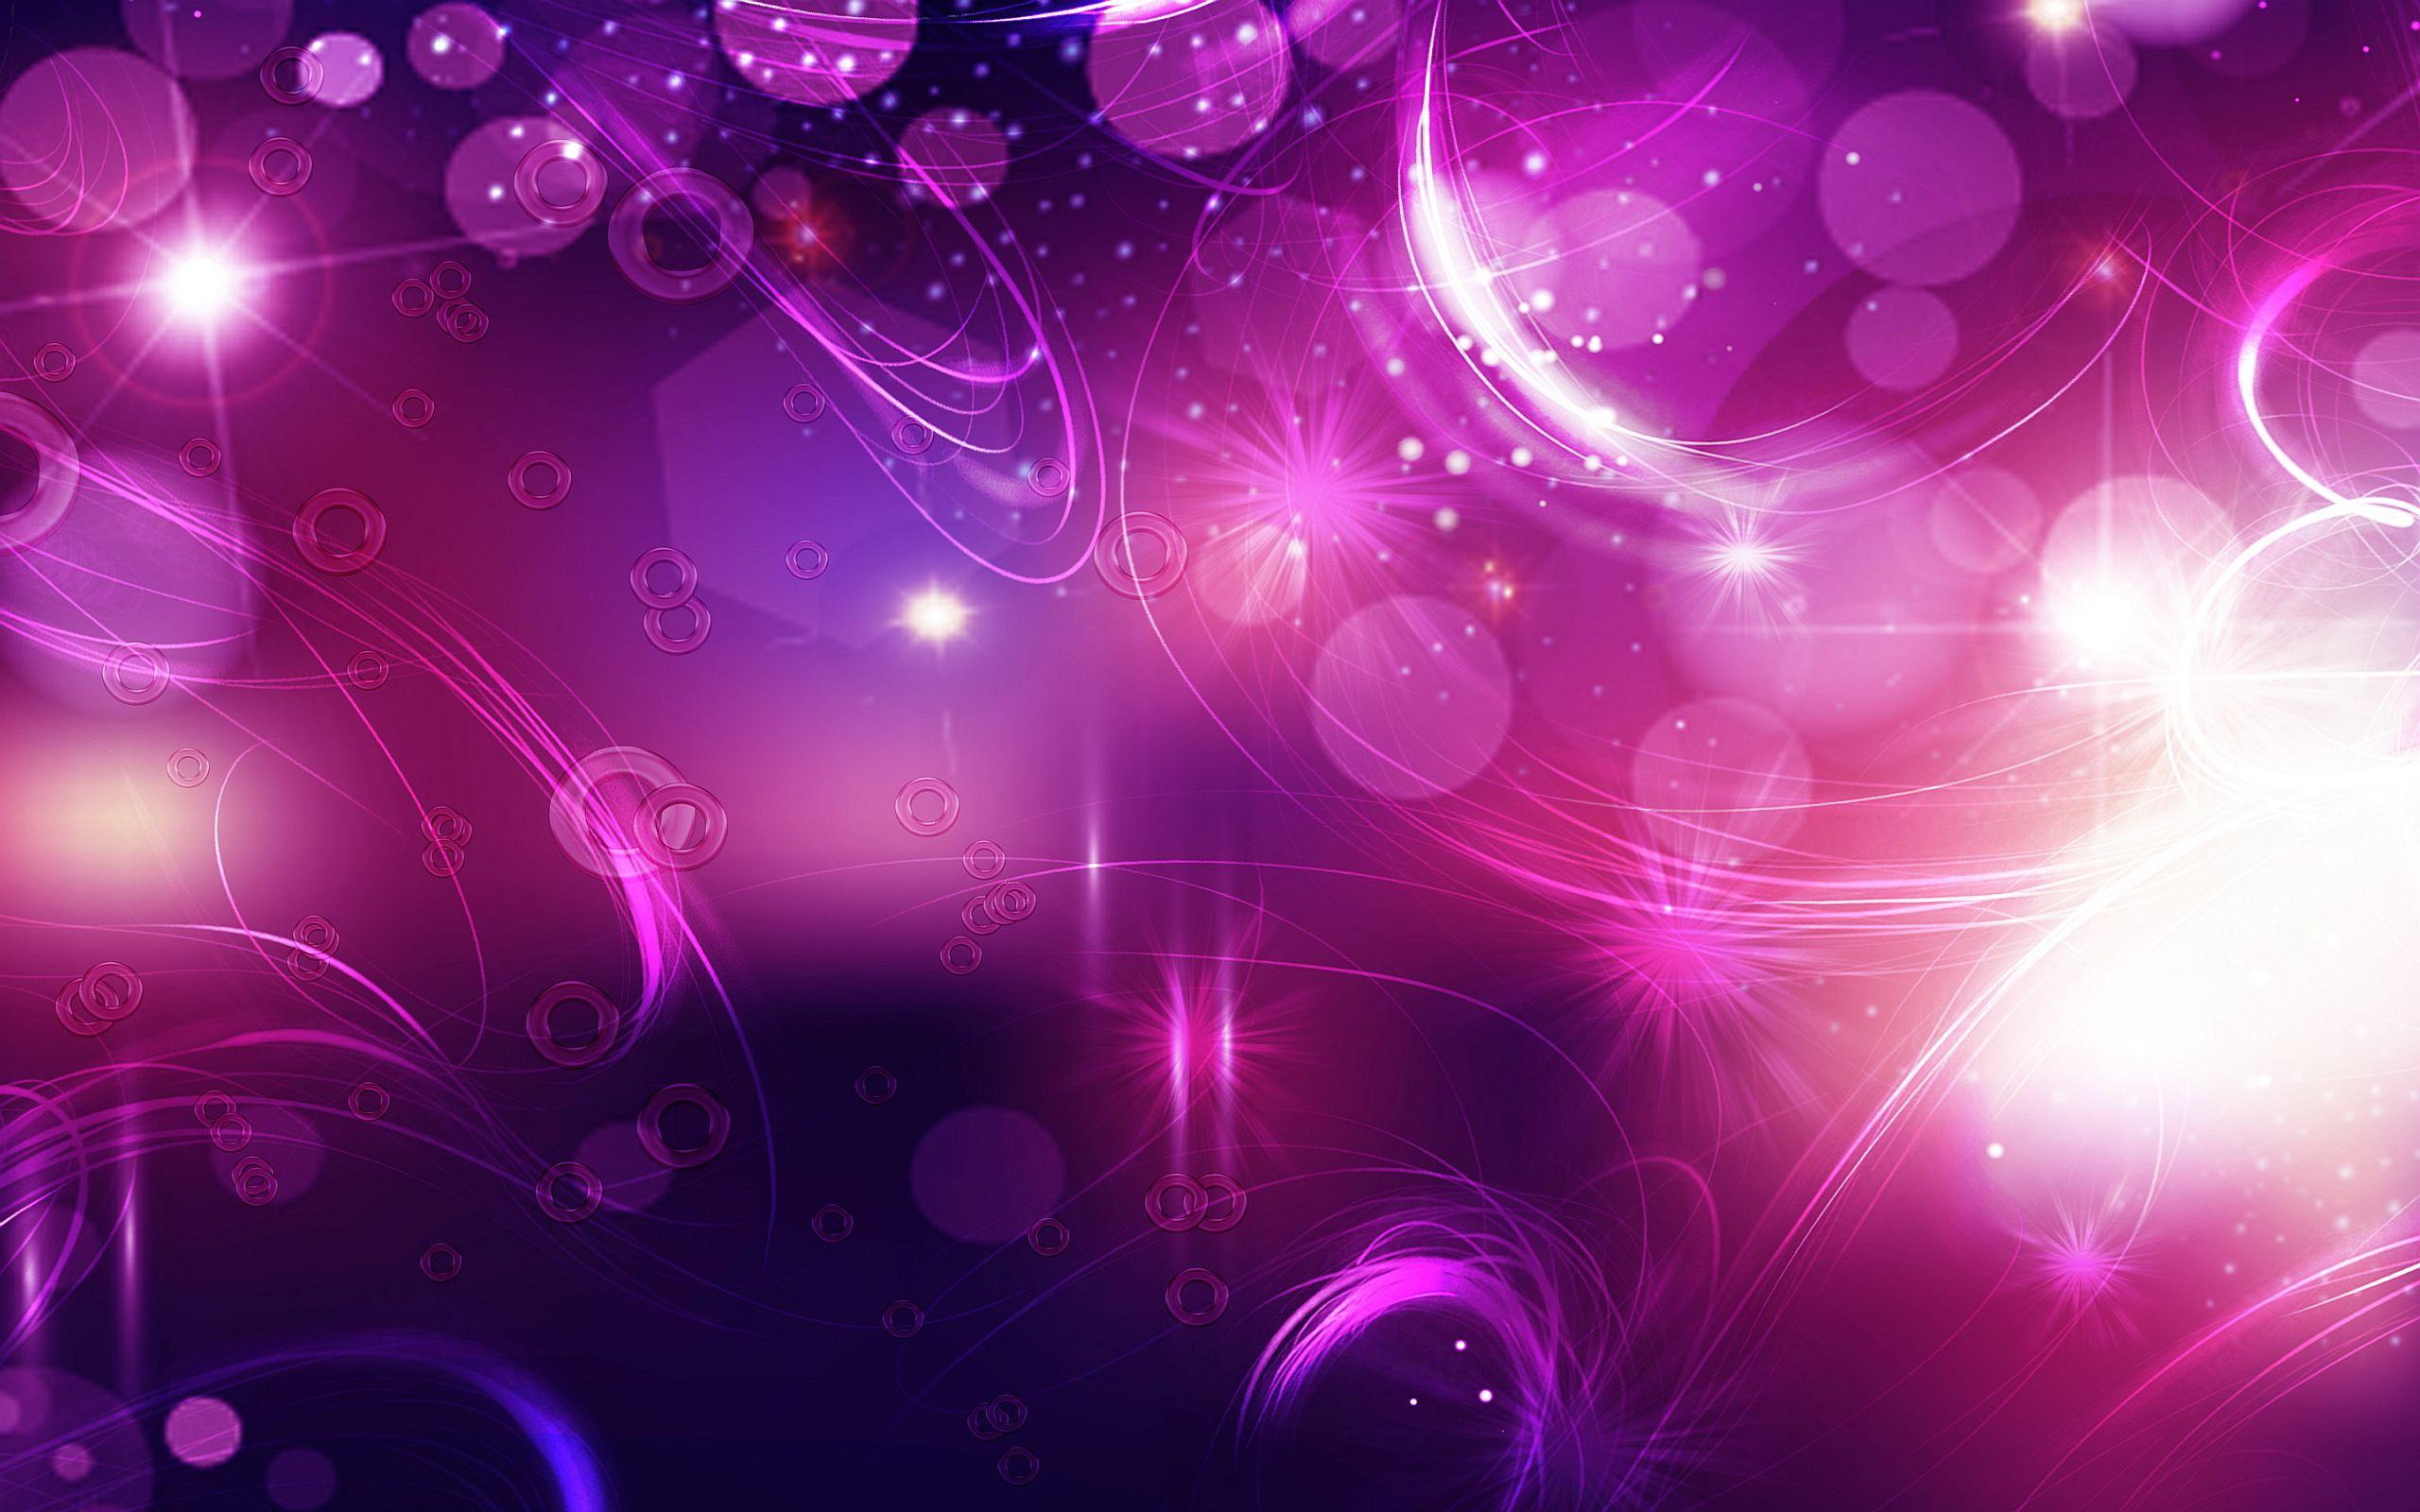 purple wallpaper A76